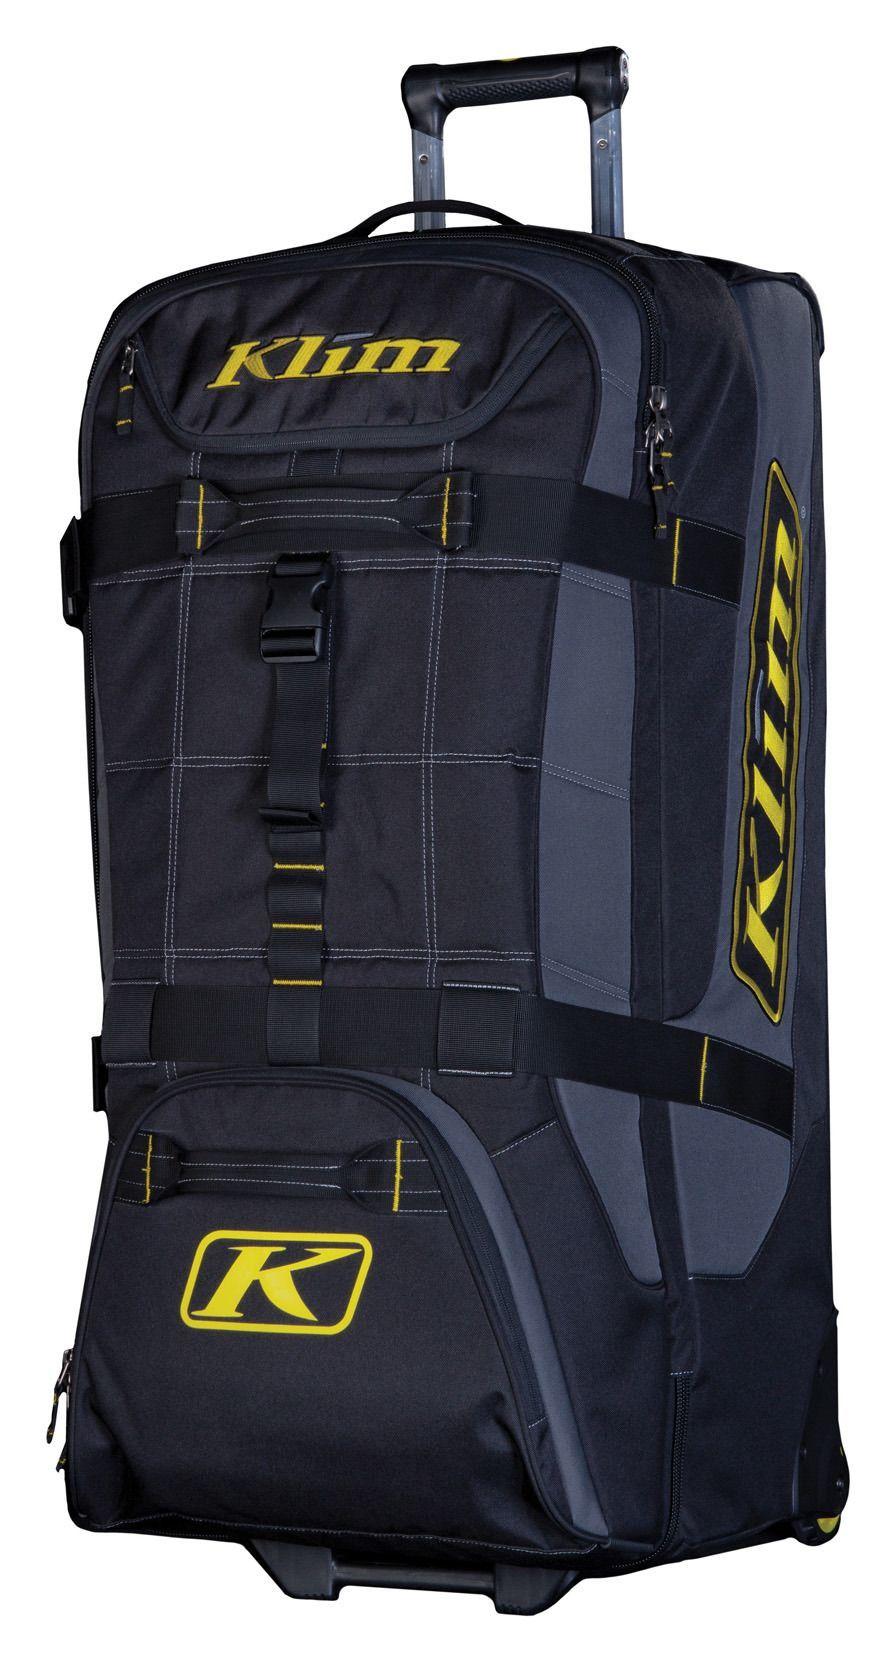 Klim Kodiak Gear Bag Revzilla